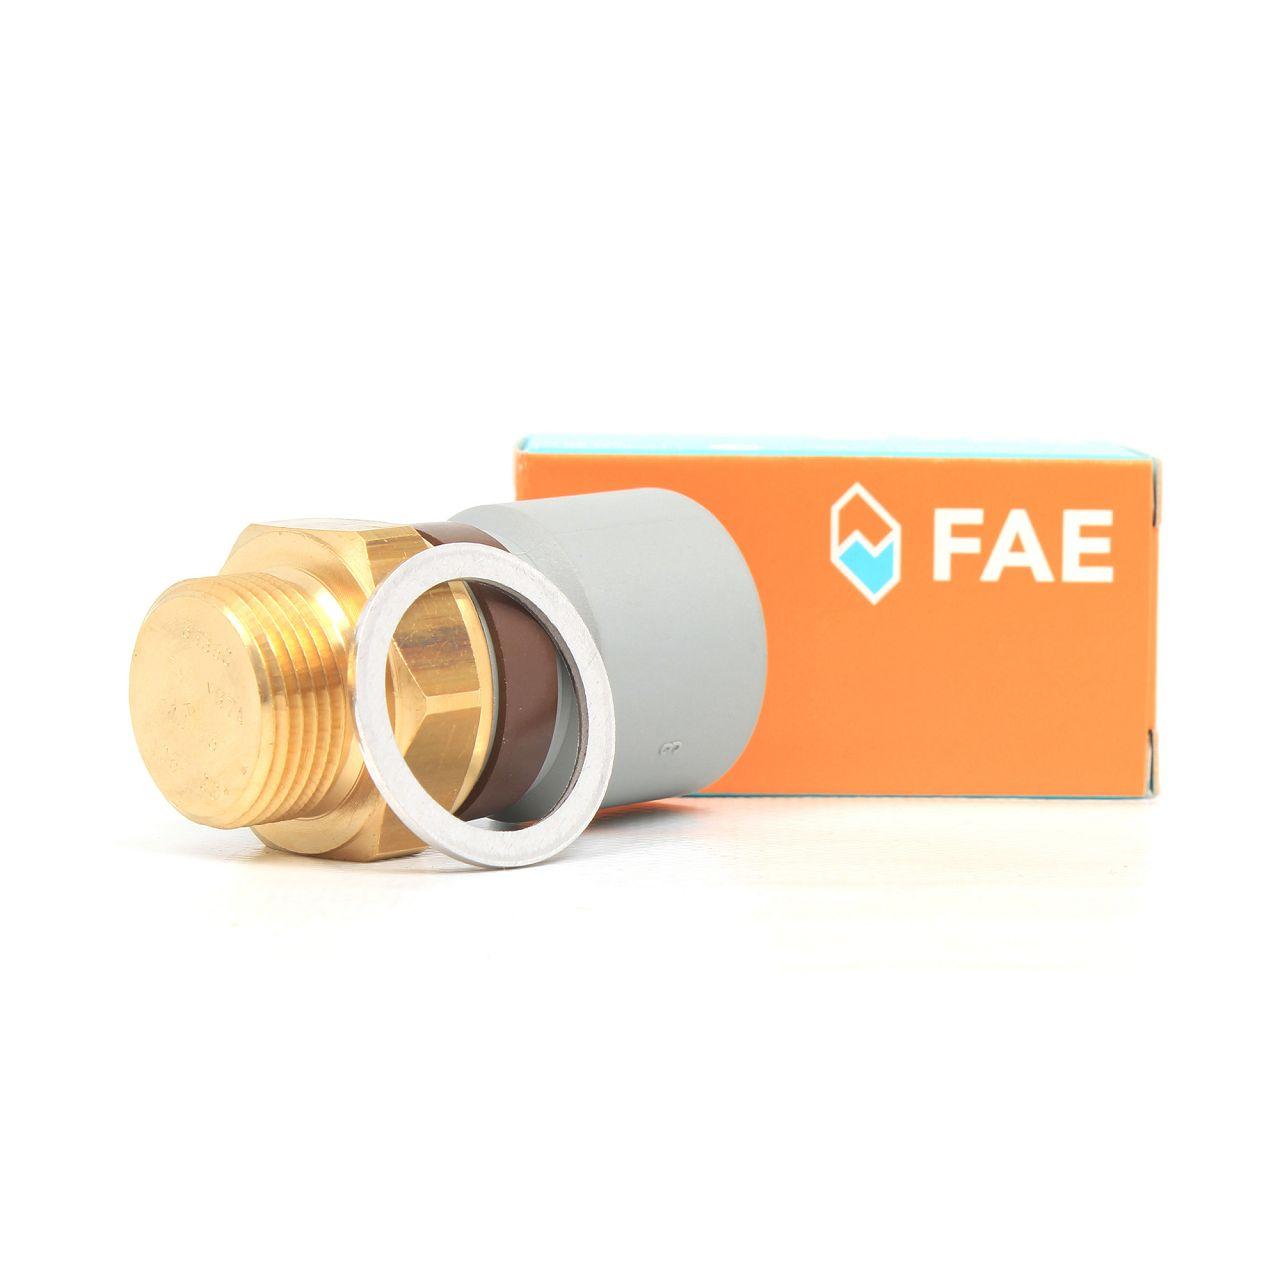 FAE Thermoschalter Temperaturschalter Motorkühler Kühlerlüfter 38360